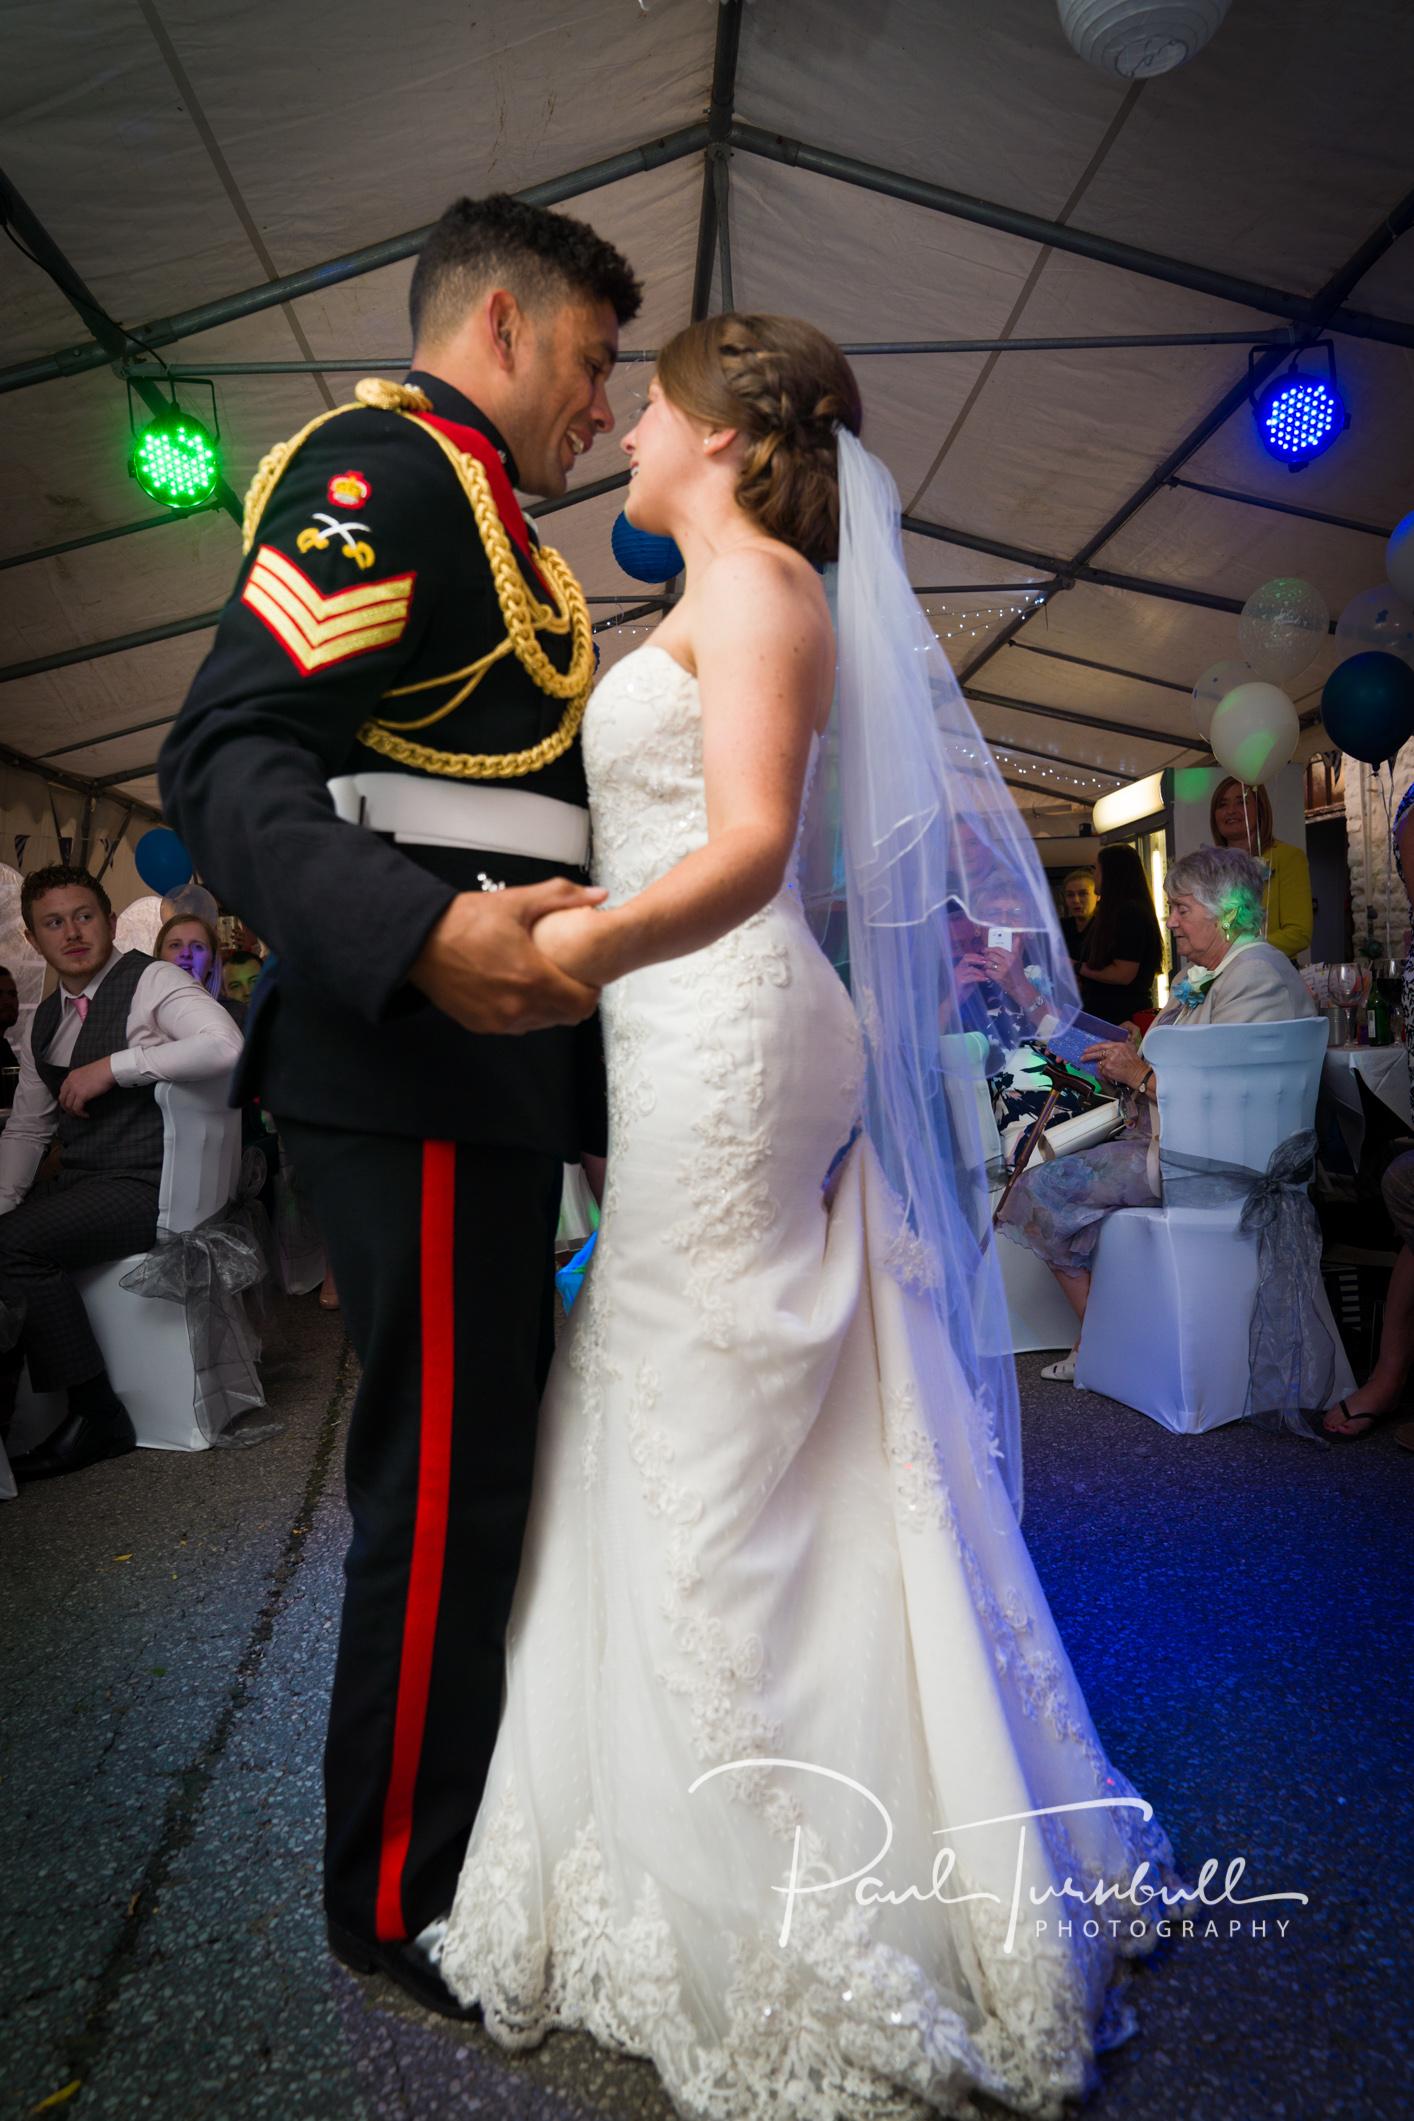 wedding-photographer-south-dalton-walkington-yorkshire-emma-james-082.jpg